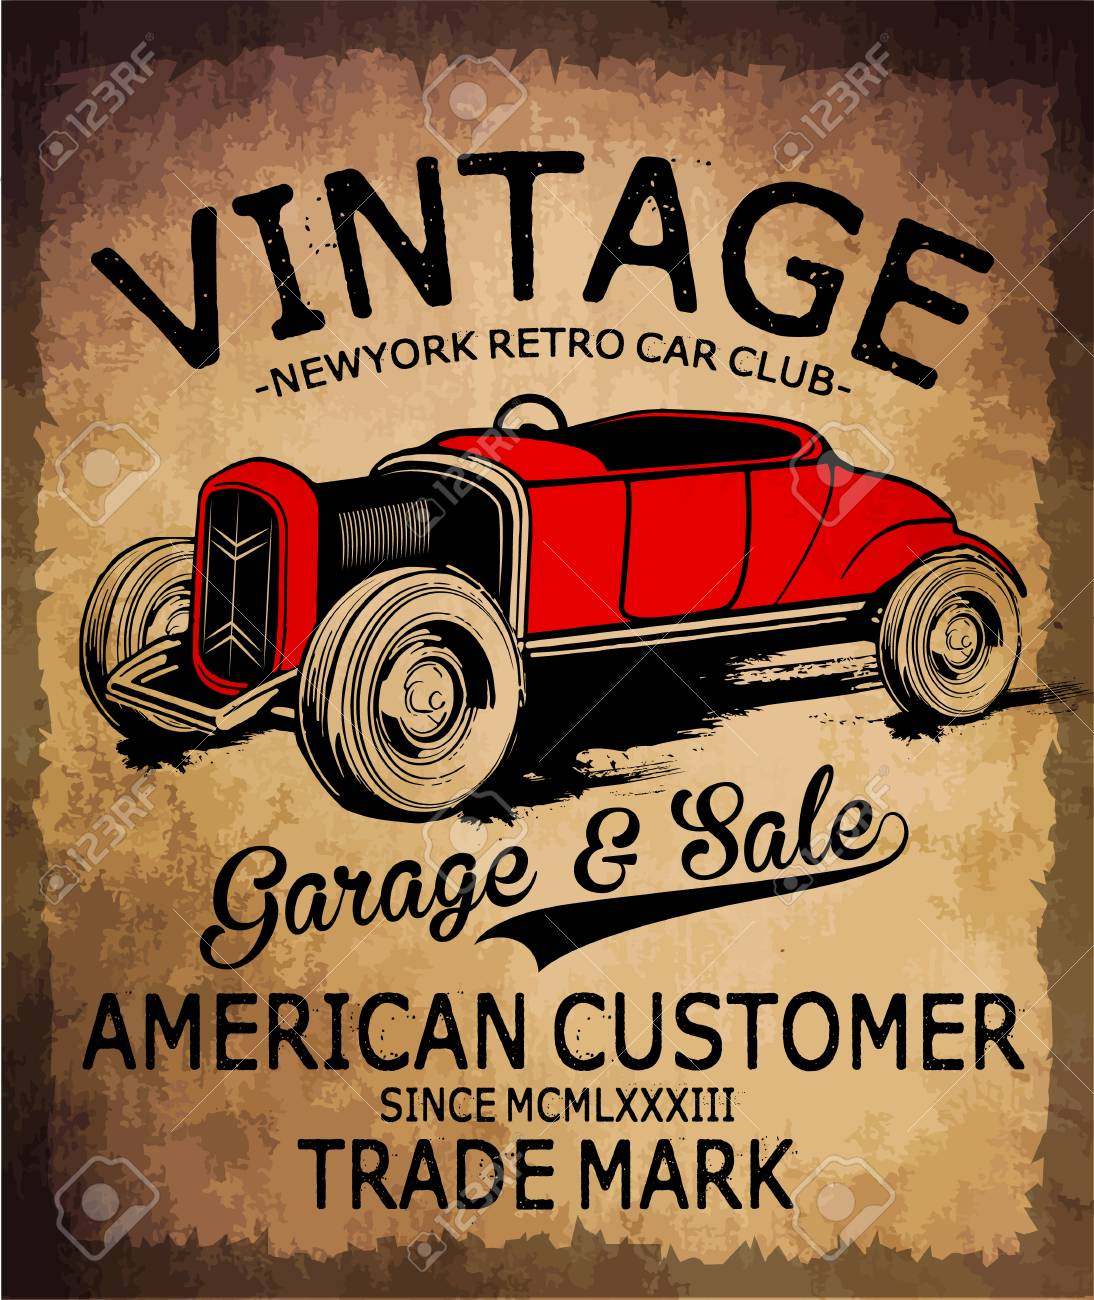 Vintage car tee graphic design - 58386858